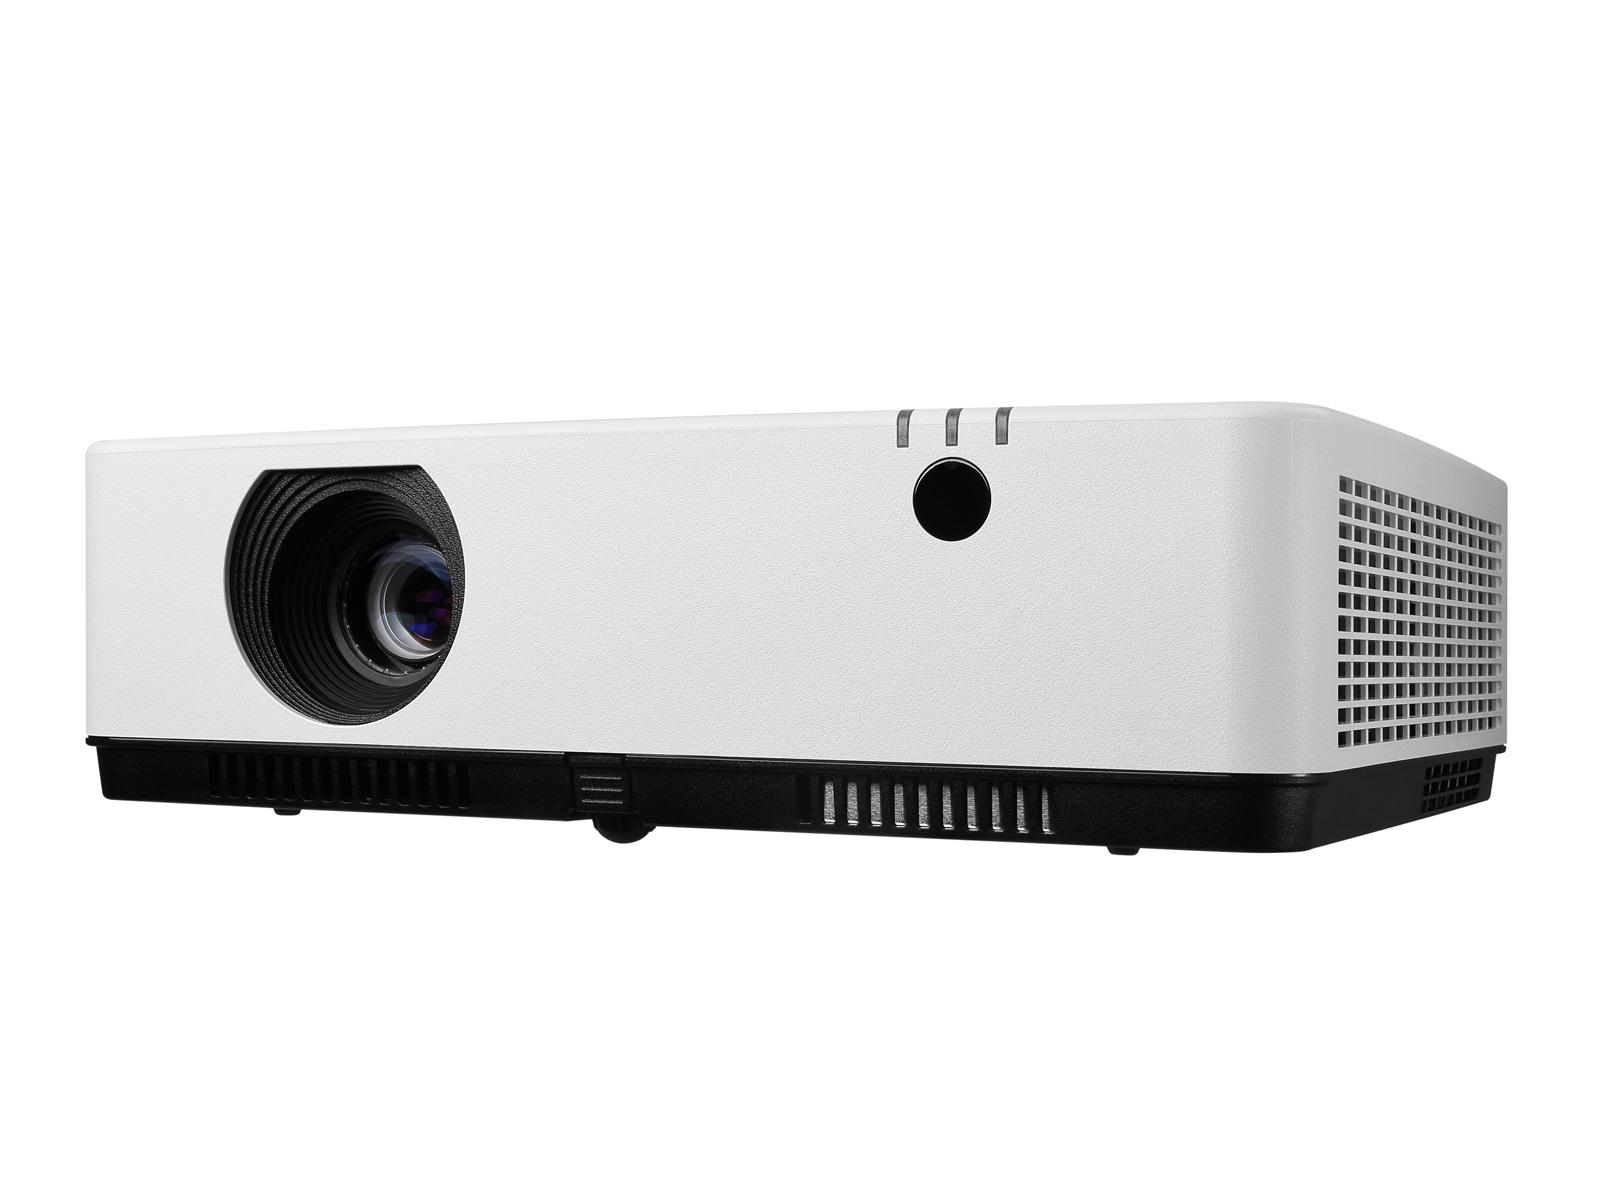 NEC MC332W data projector Desktop projector 3300 ANSI lumens 3LCD WXGA (1280x800) White